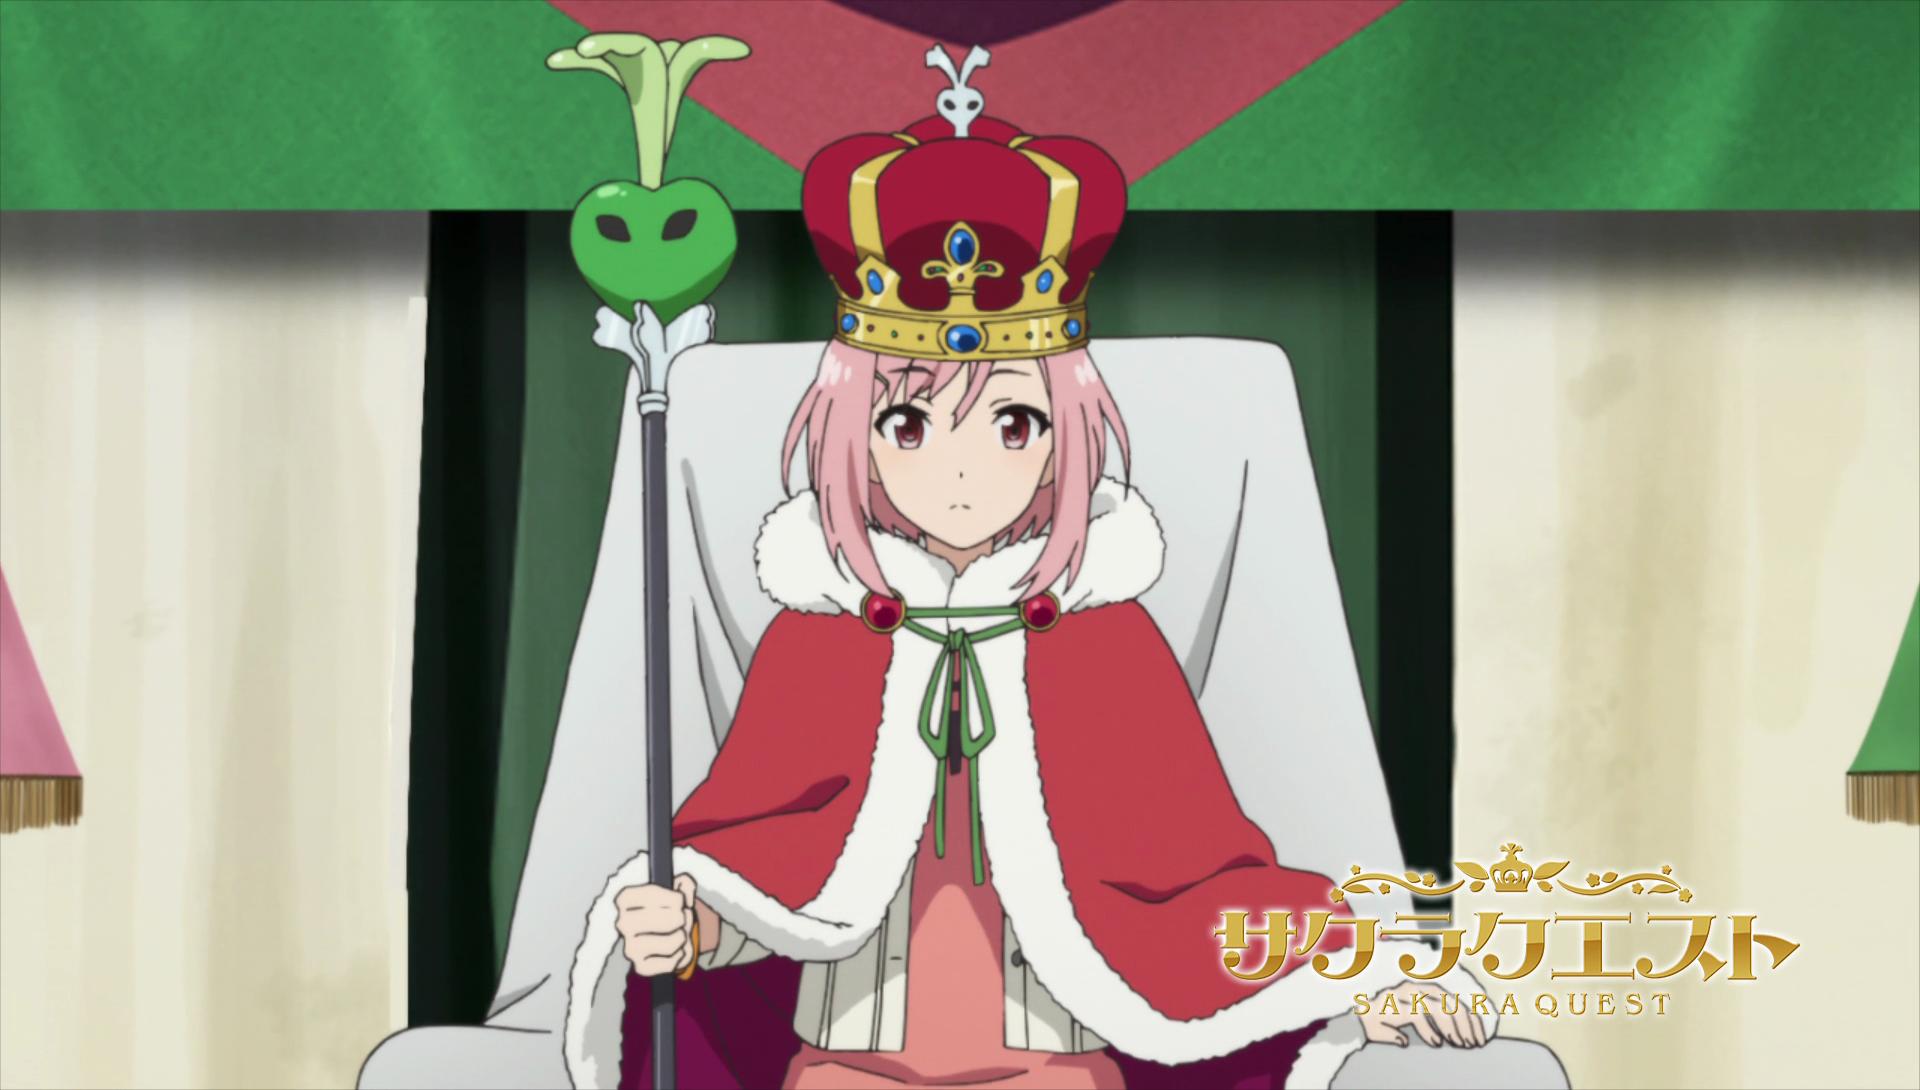 On-Air Sakura Quest 2